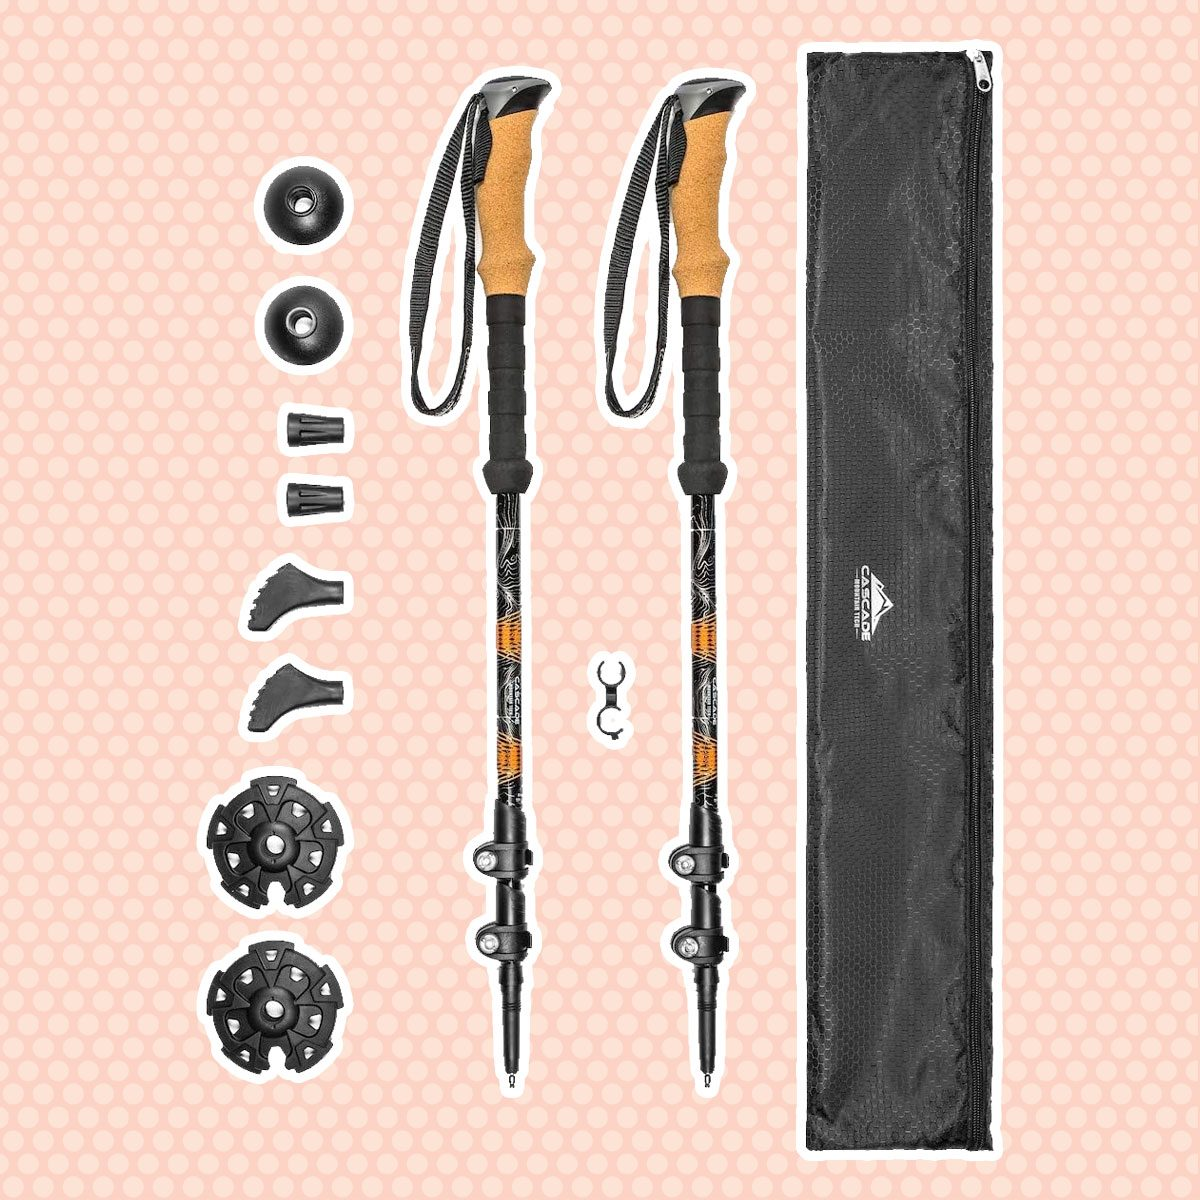 Cascade Mountain Tech Trekking Poles - Aluminum Folding Hiking Walking Sticks with Quick Adjustable Locks (Set of 2)